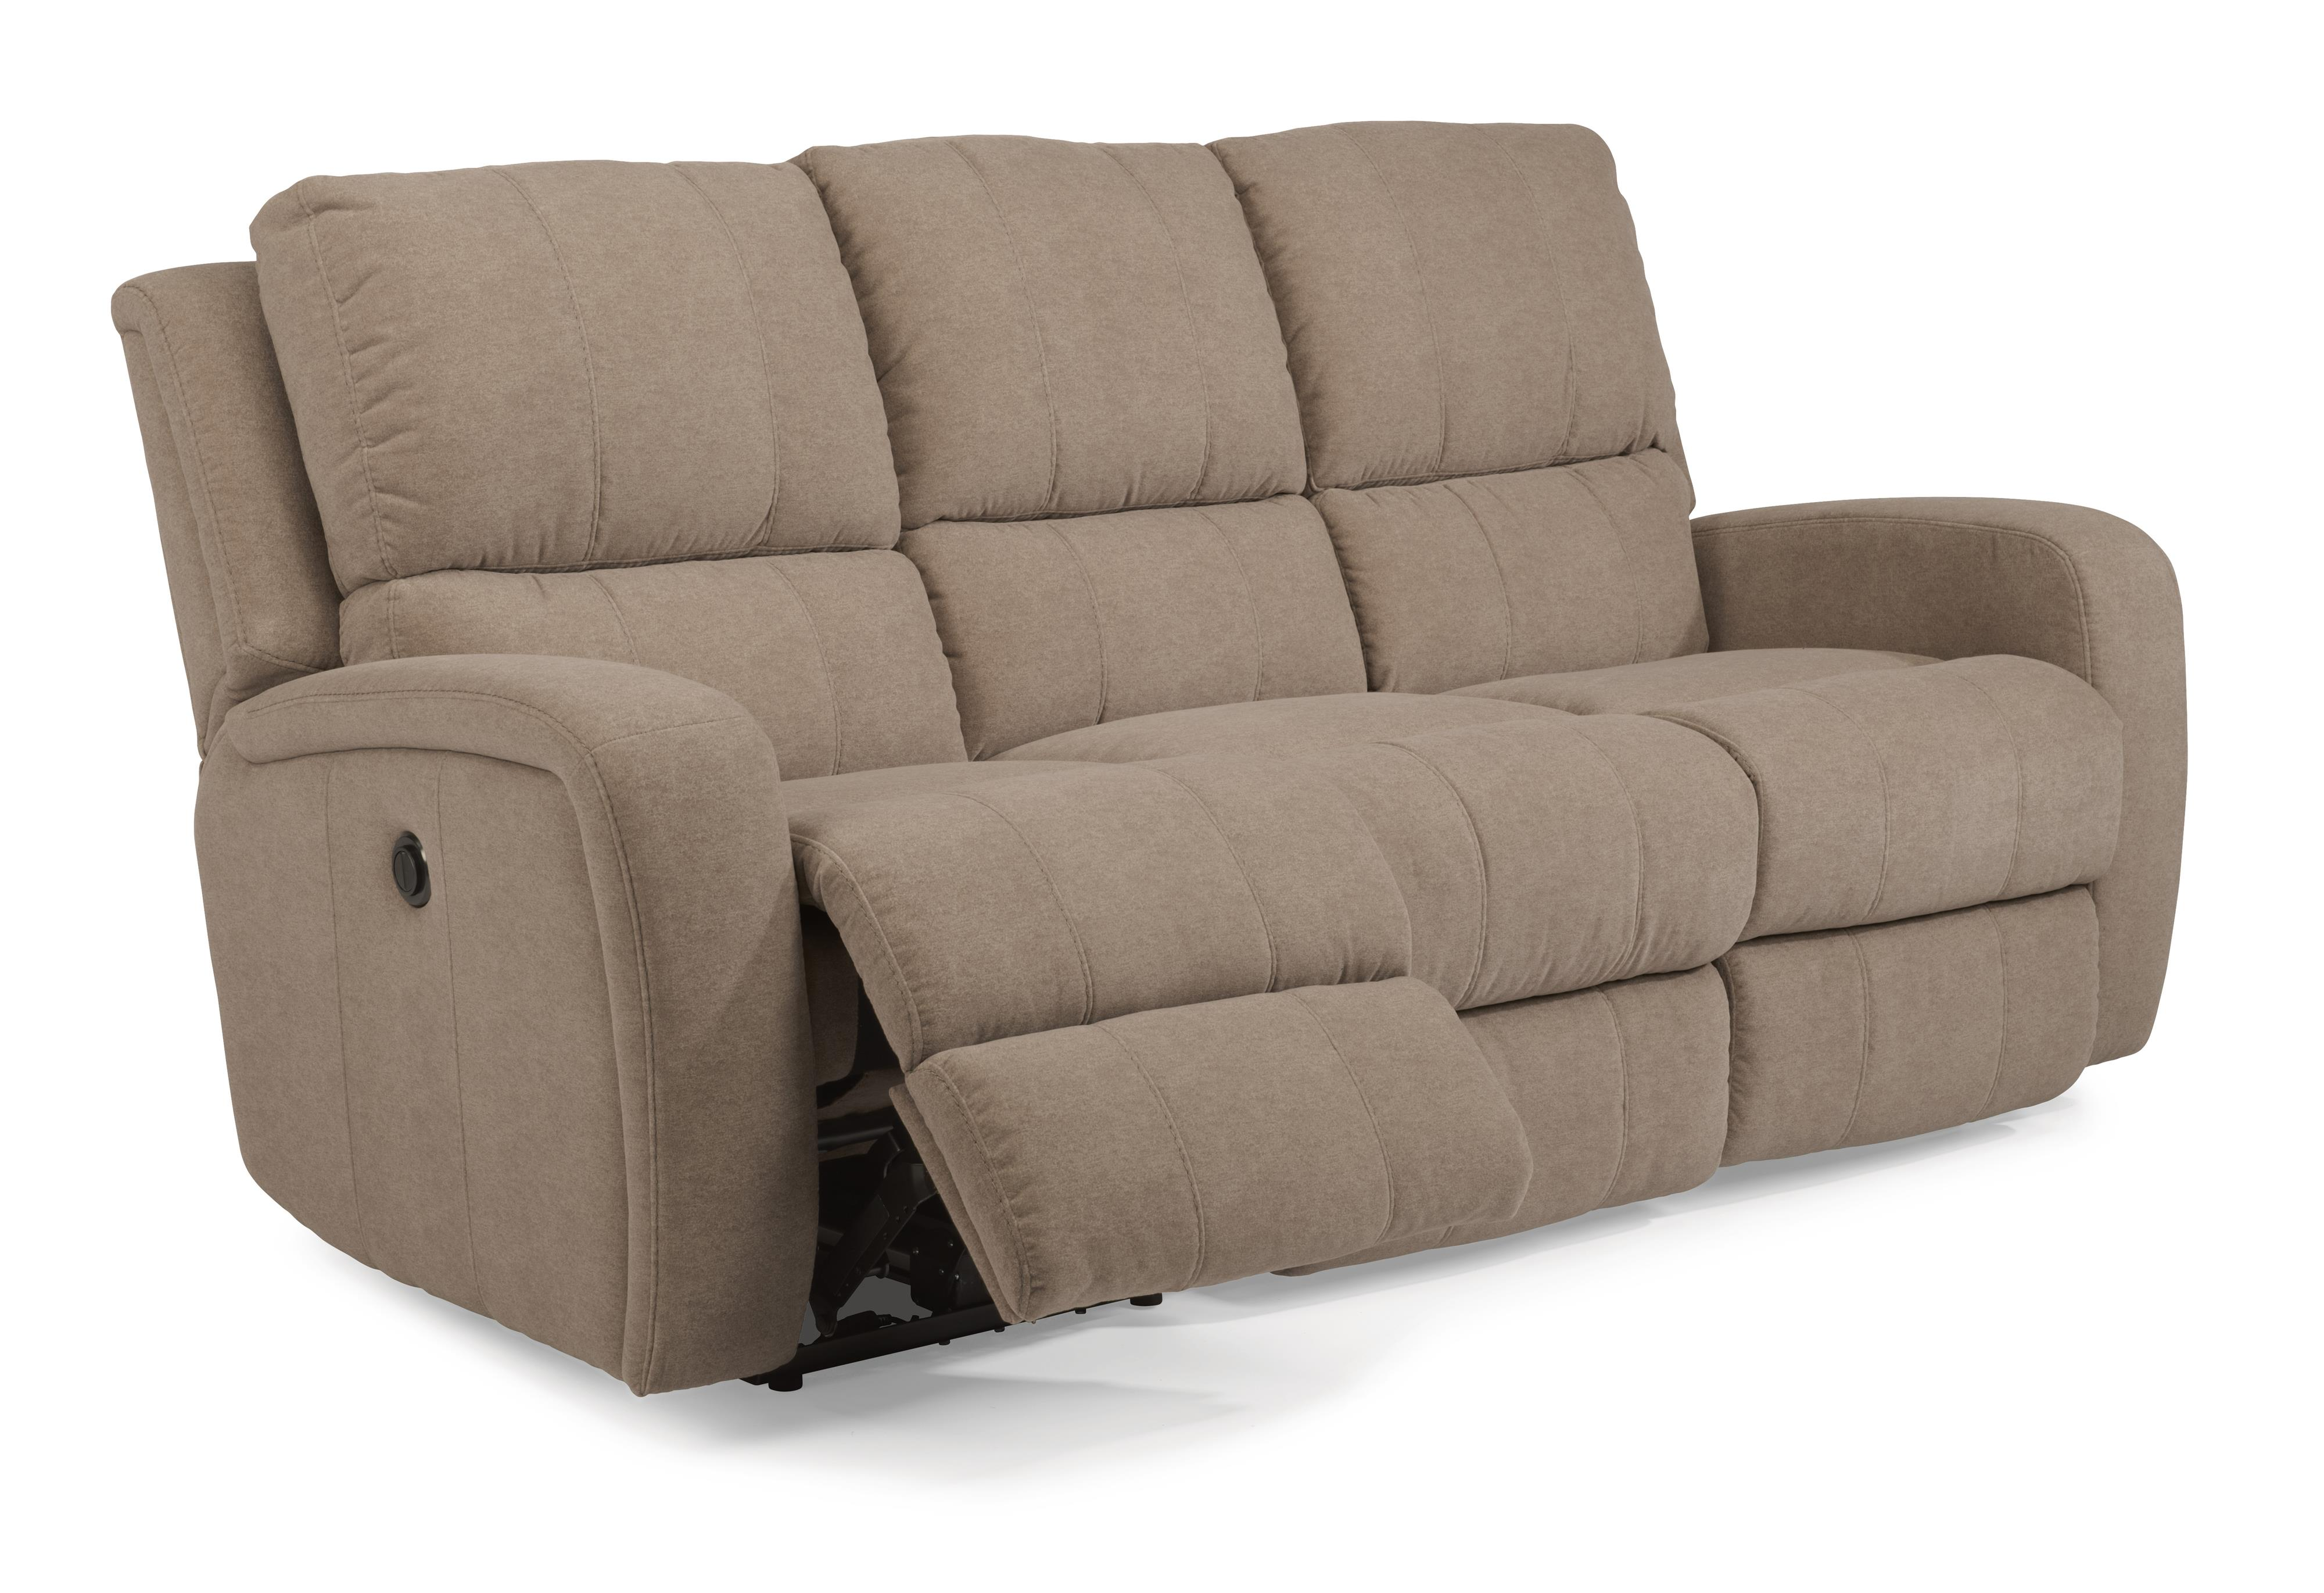 Flexsteel Latitudes-Hammond Double Reclining Sofa W/ Power - Item Number:  1156-